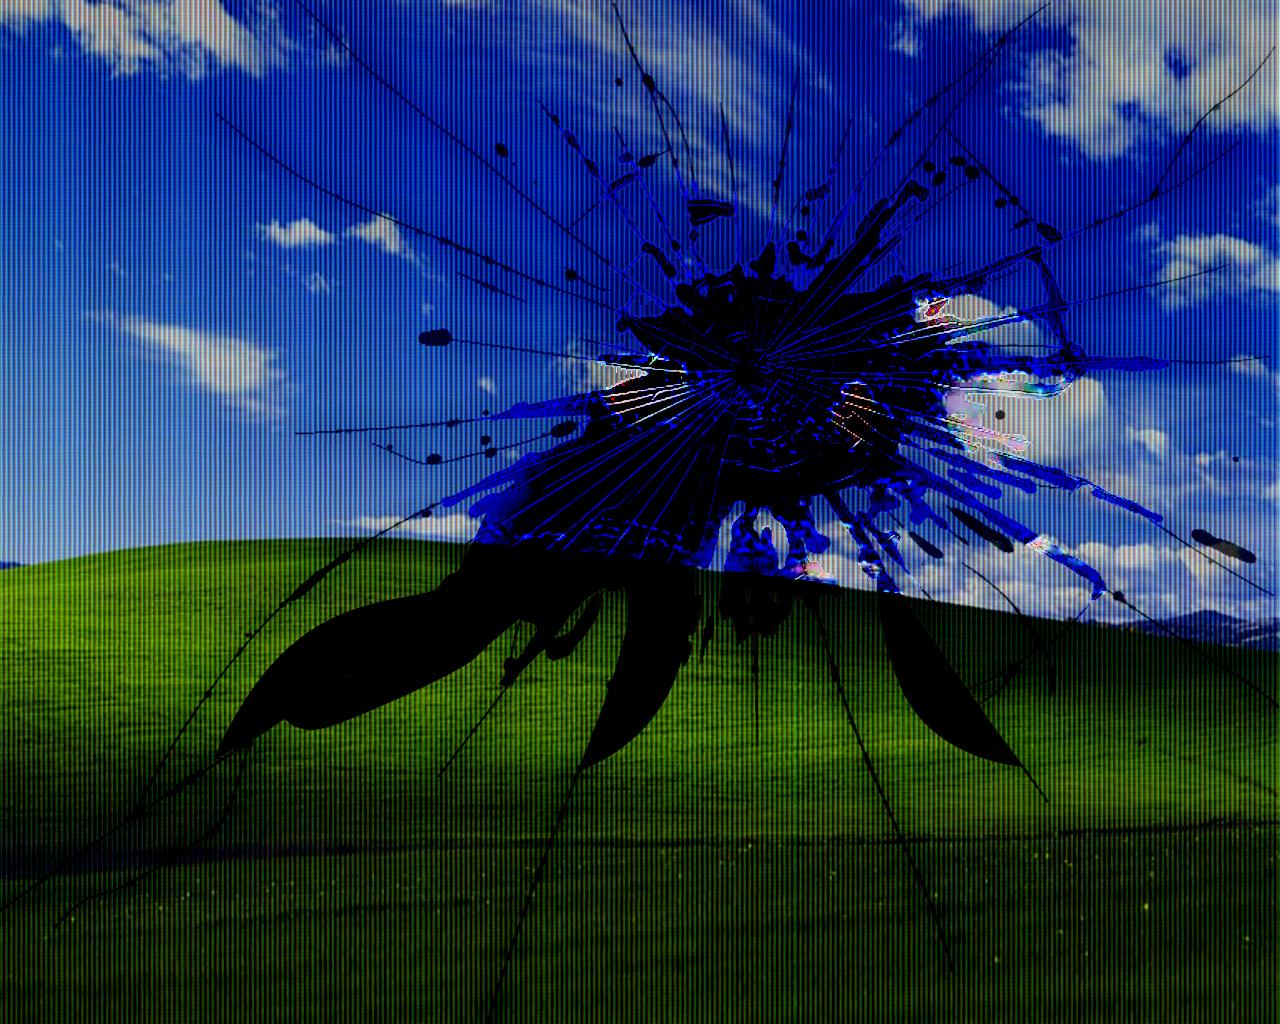 Broken LCD Wallpaper 1280x1024 Broken LCD Screens Bliss Windows 1280x1024